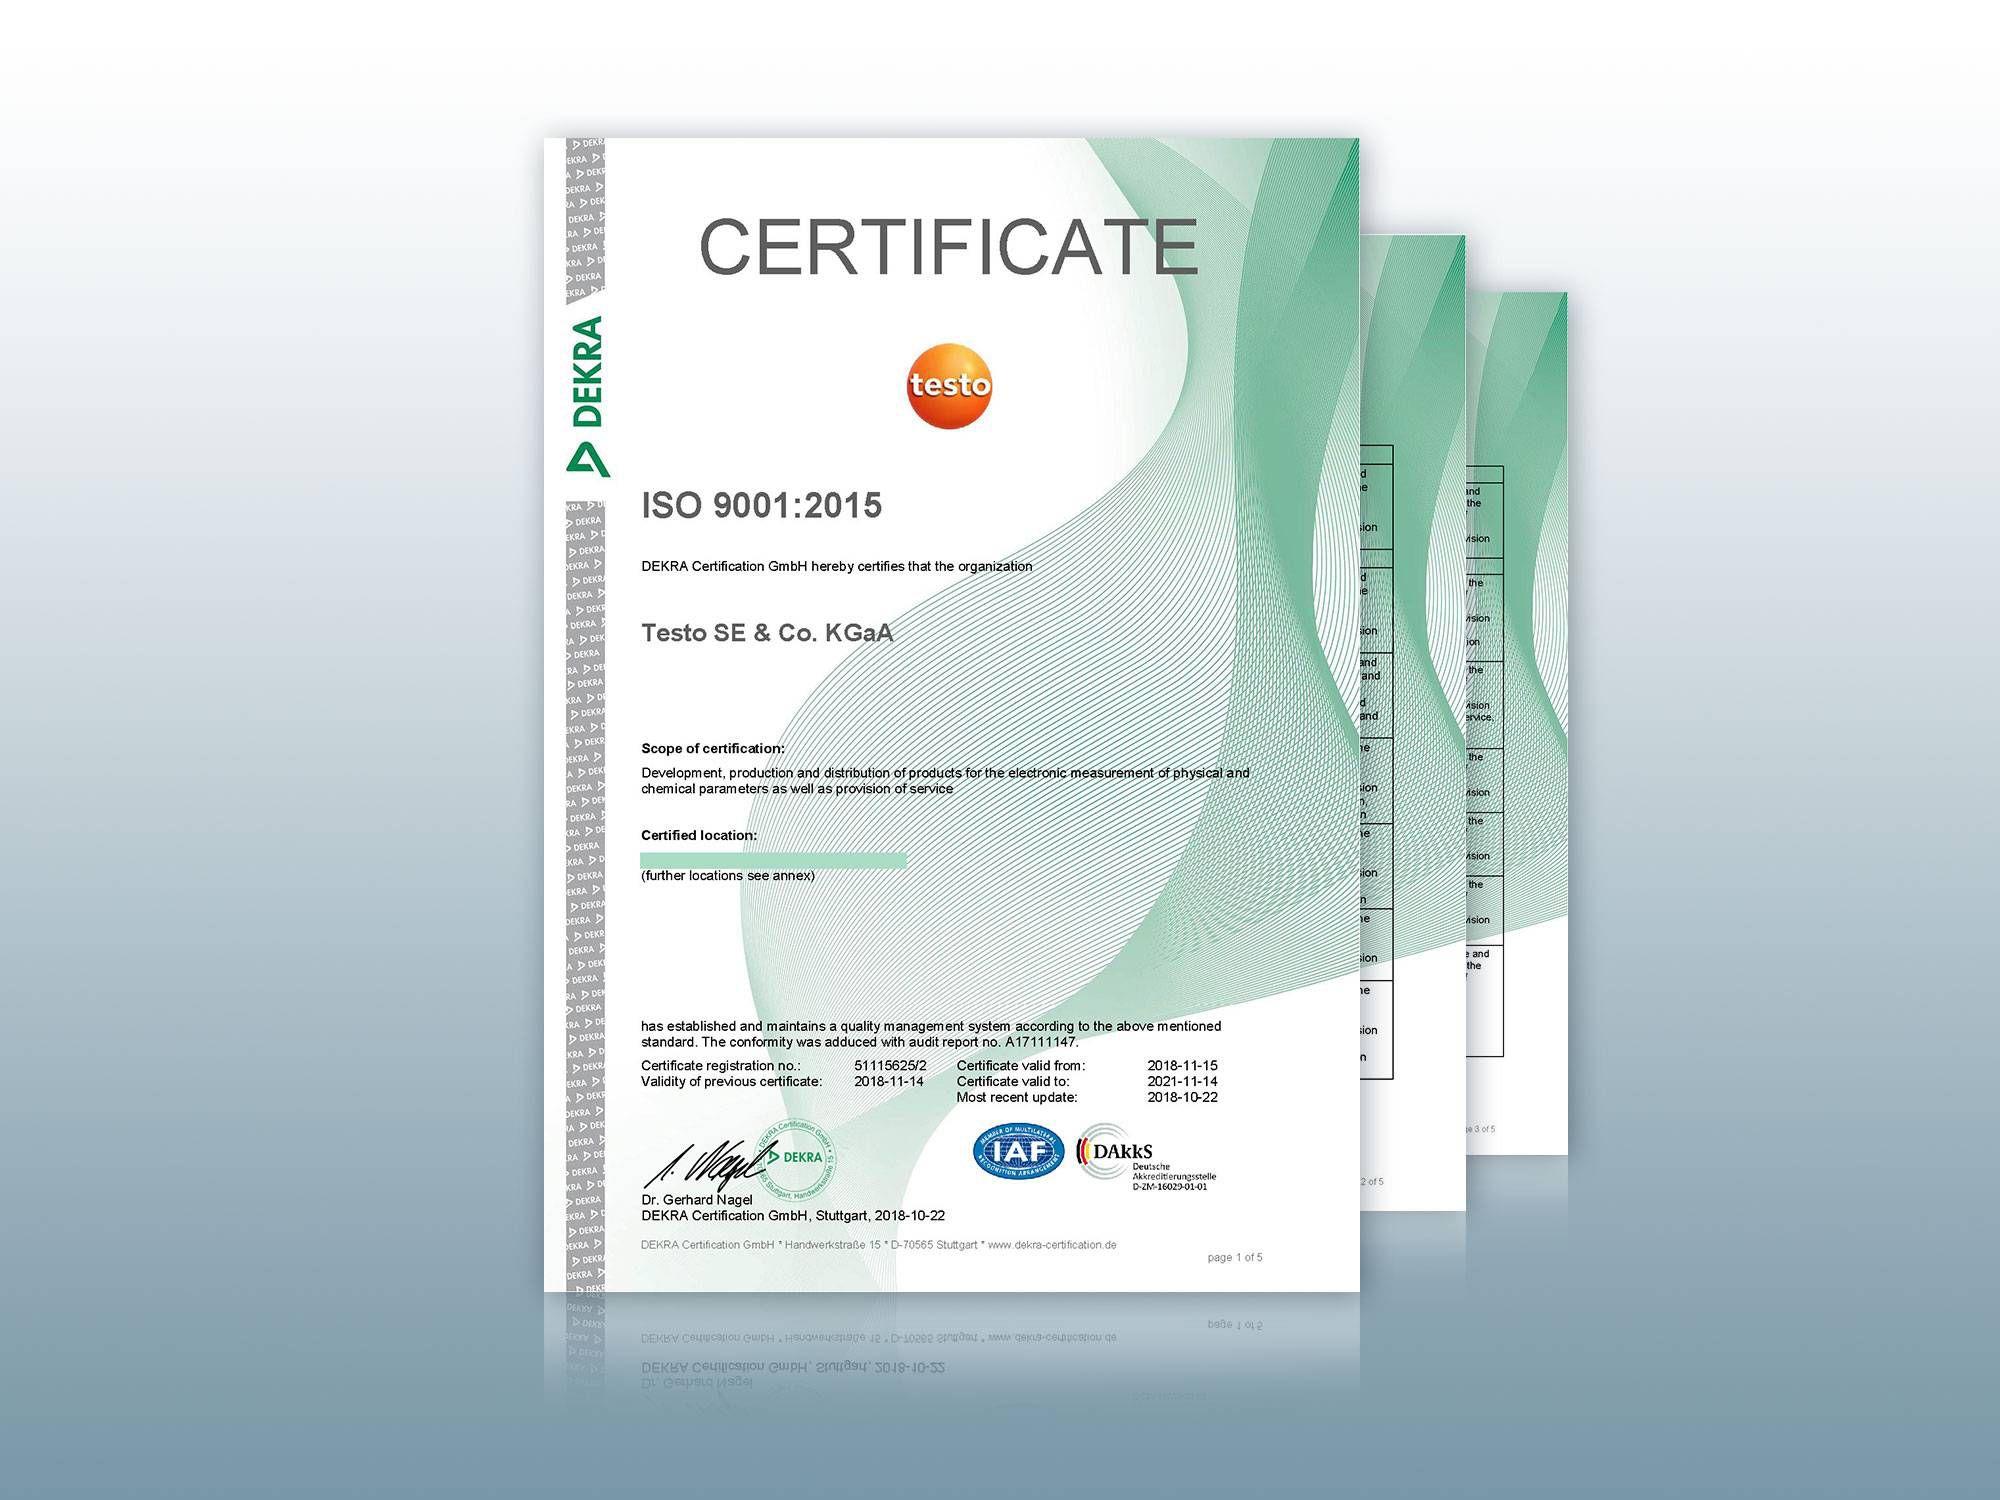 经 ISO 9001:2015 认证